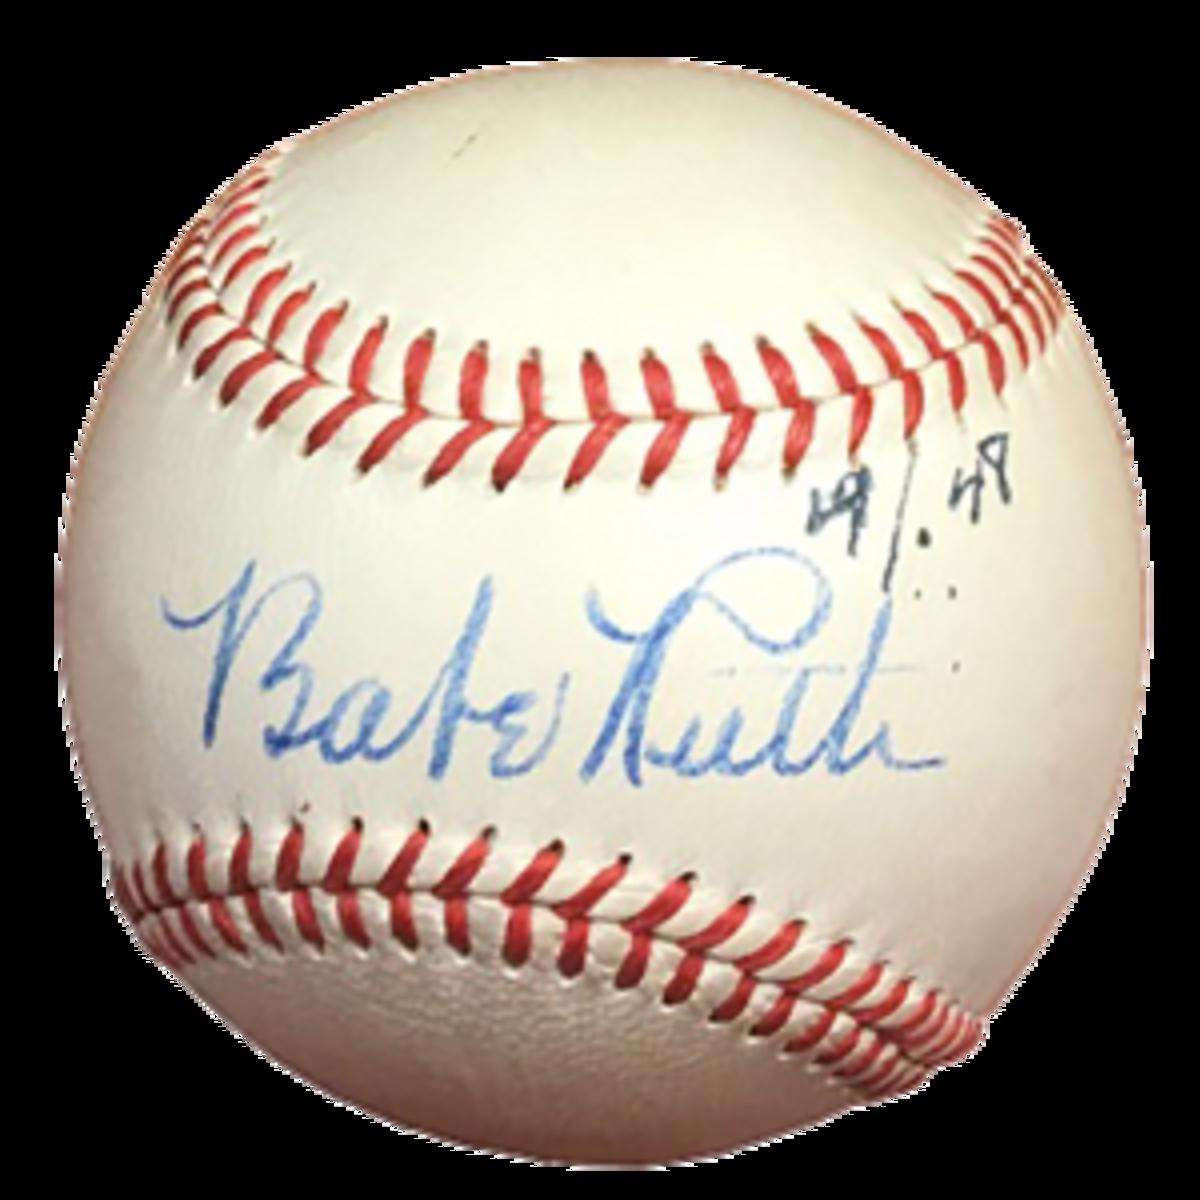 Ruthball